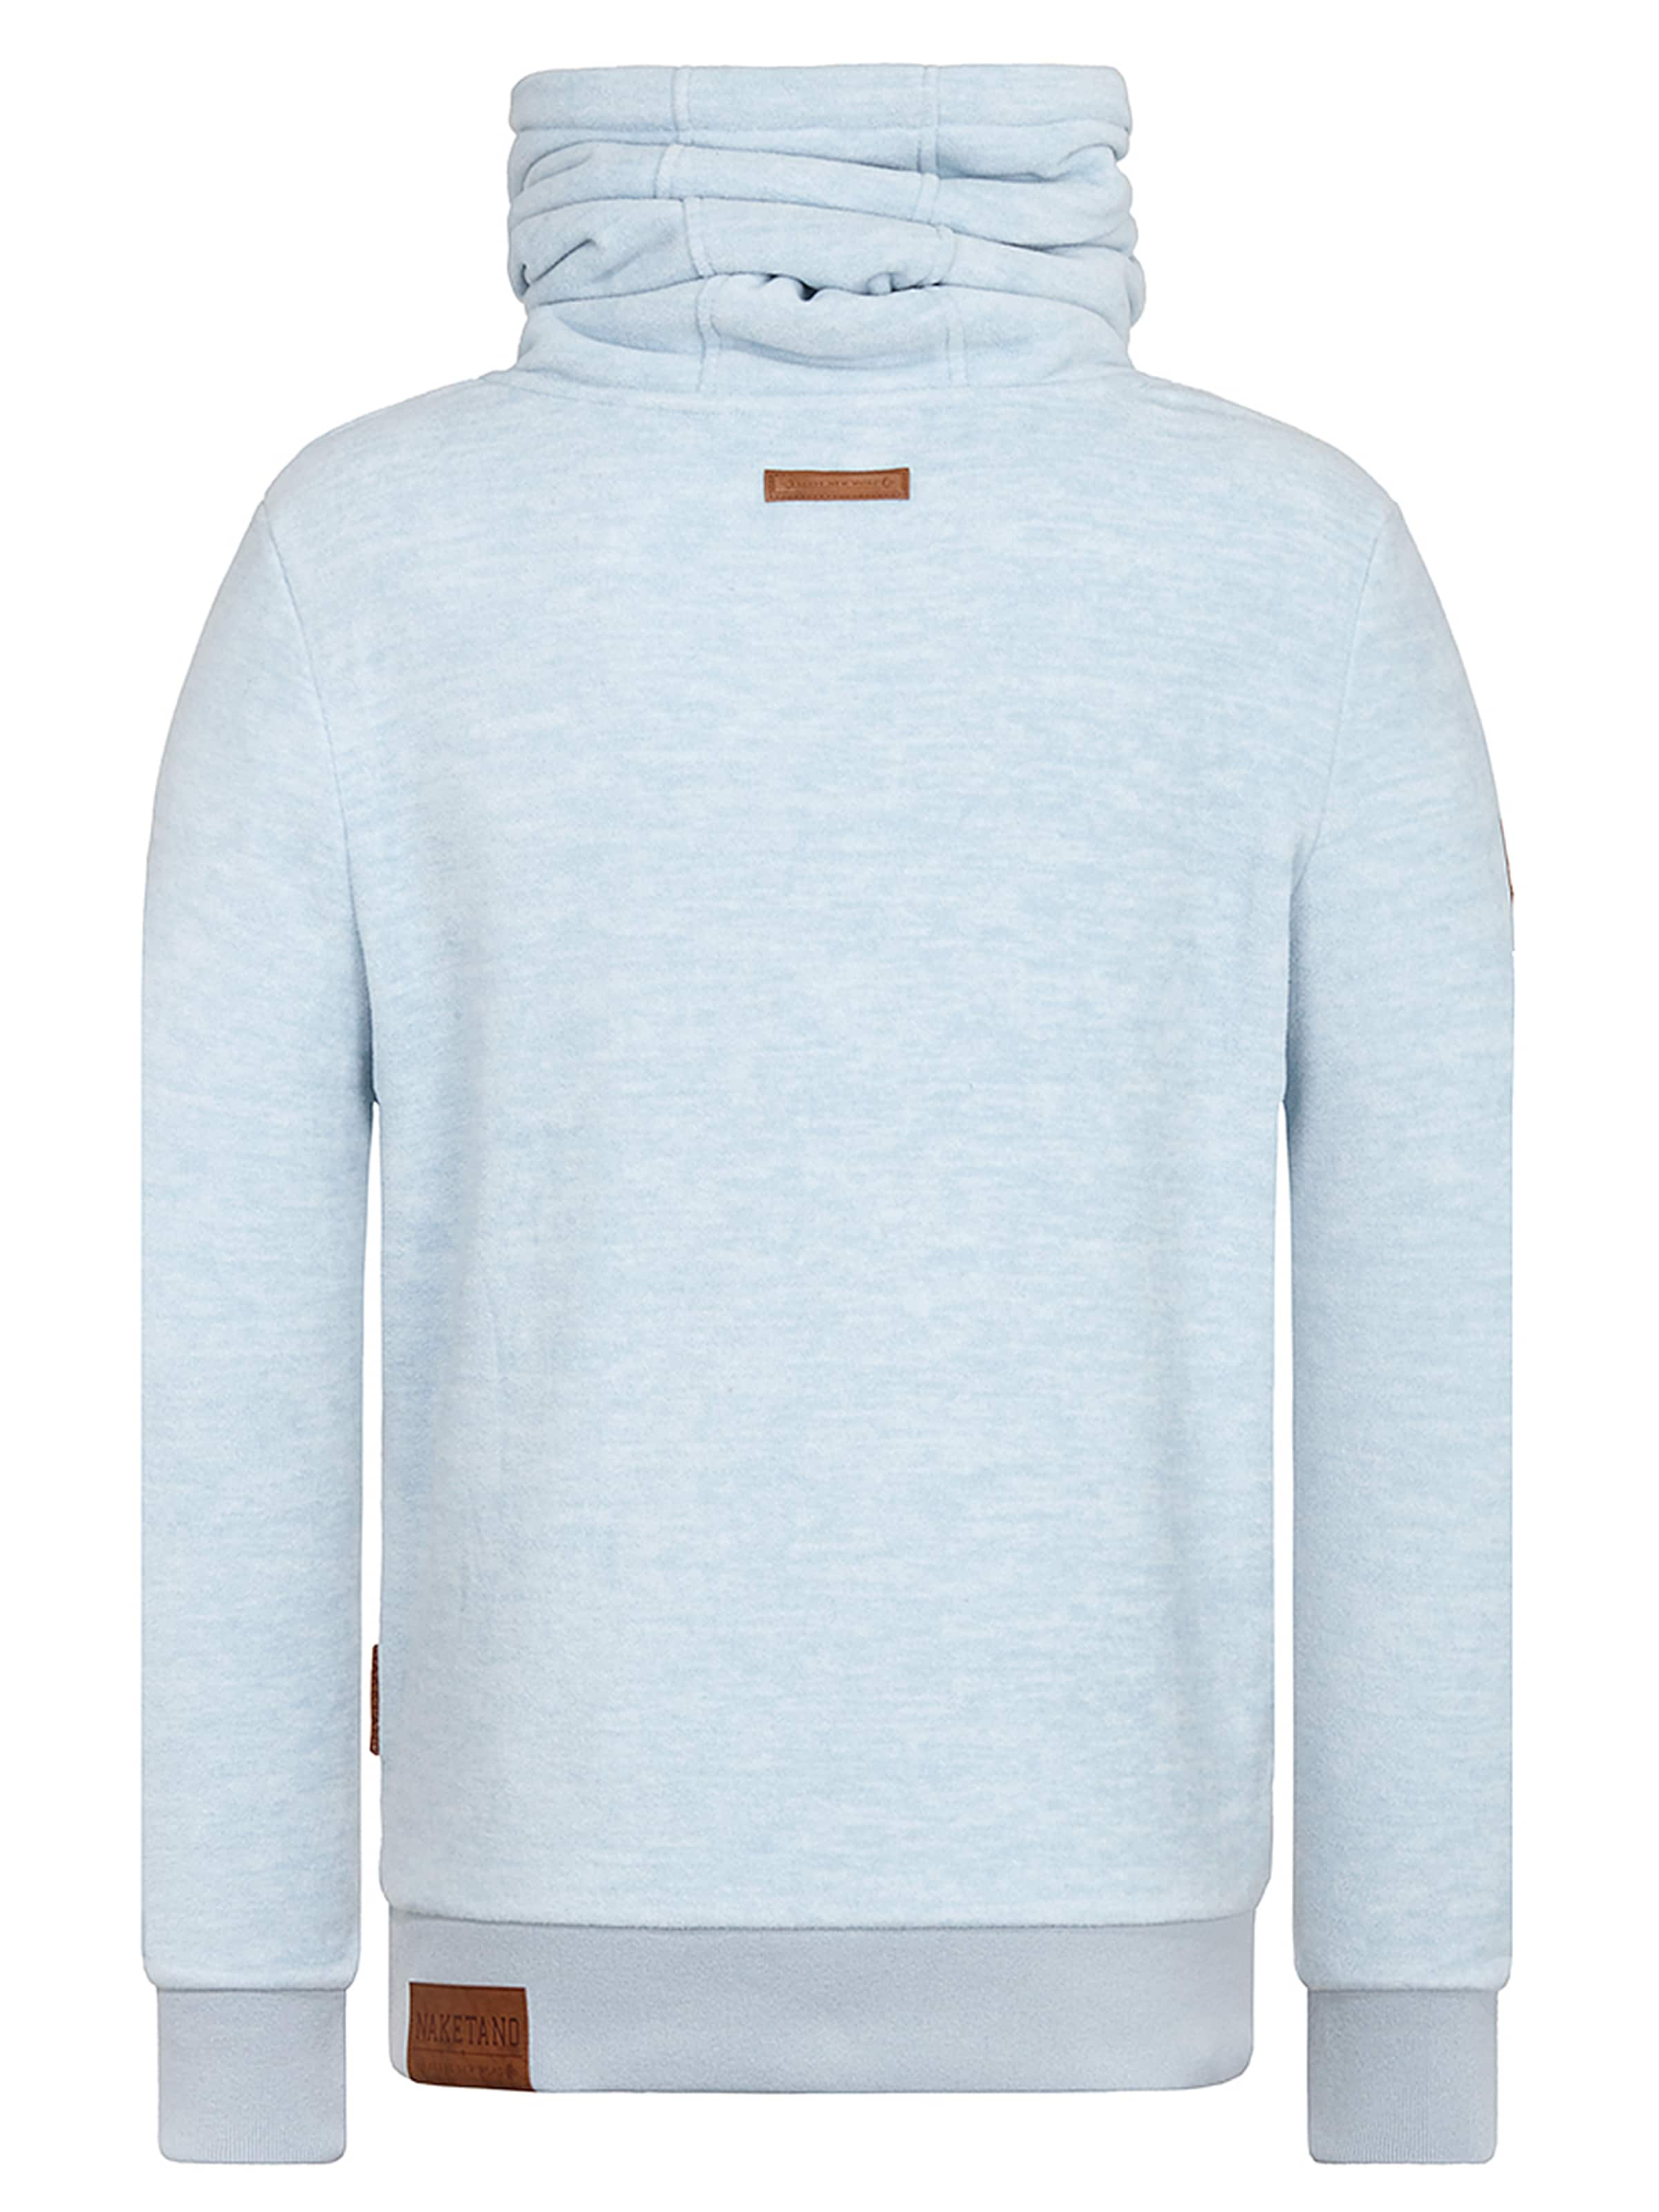 Naketano Clair En Sweat shirt Bleu dCQtshrx